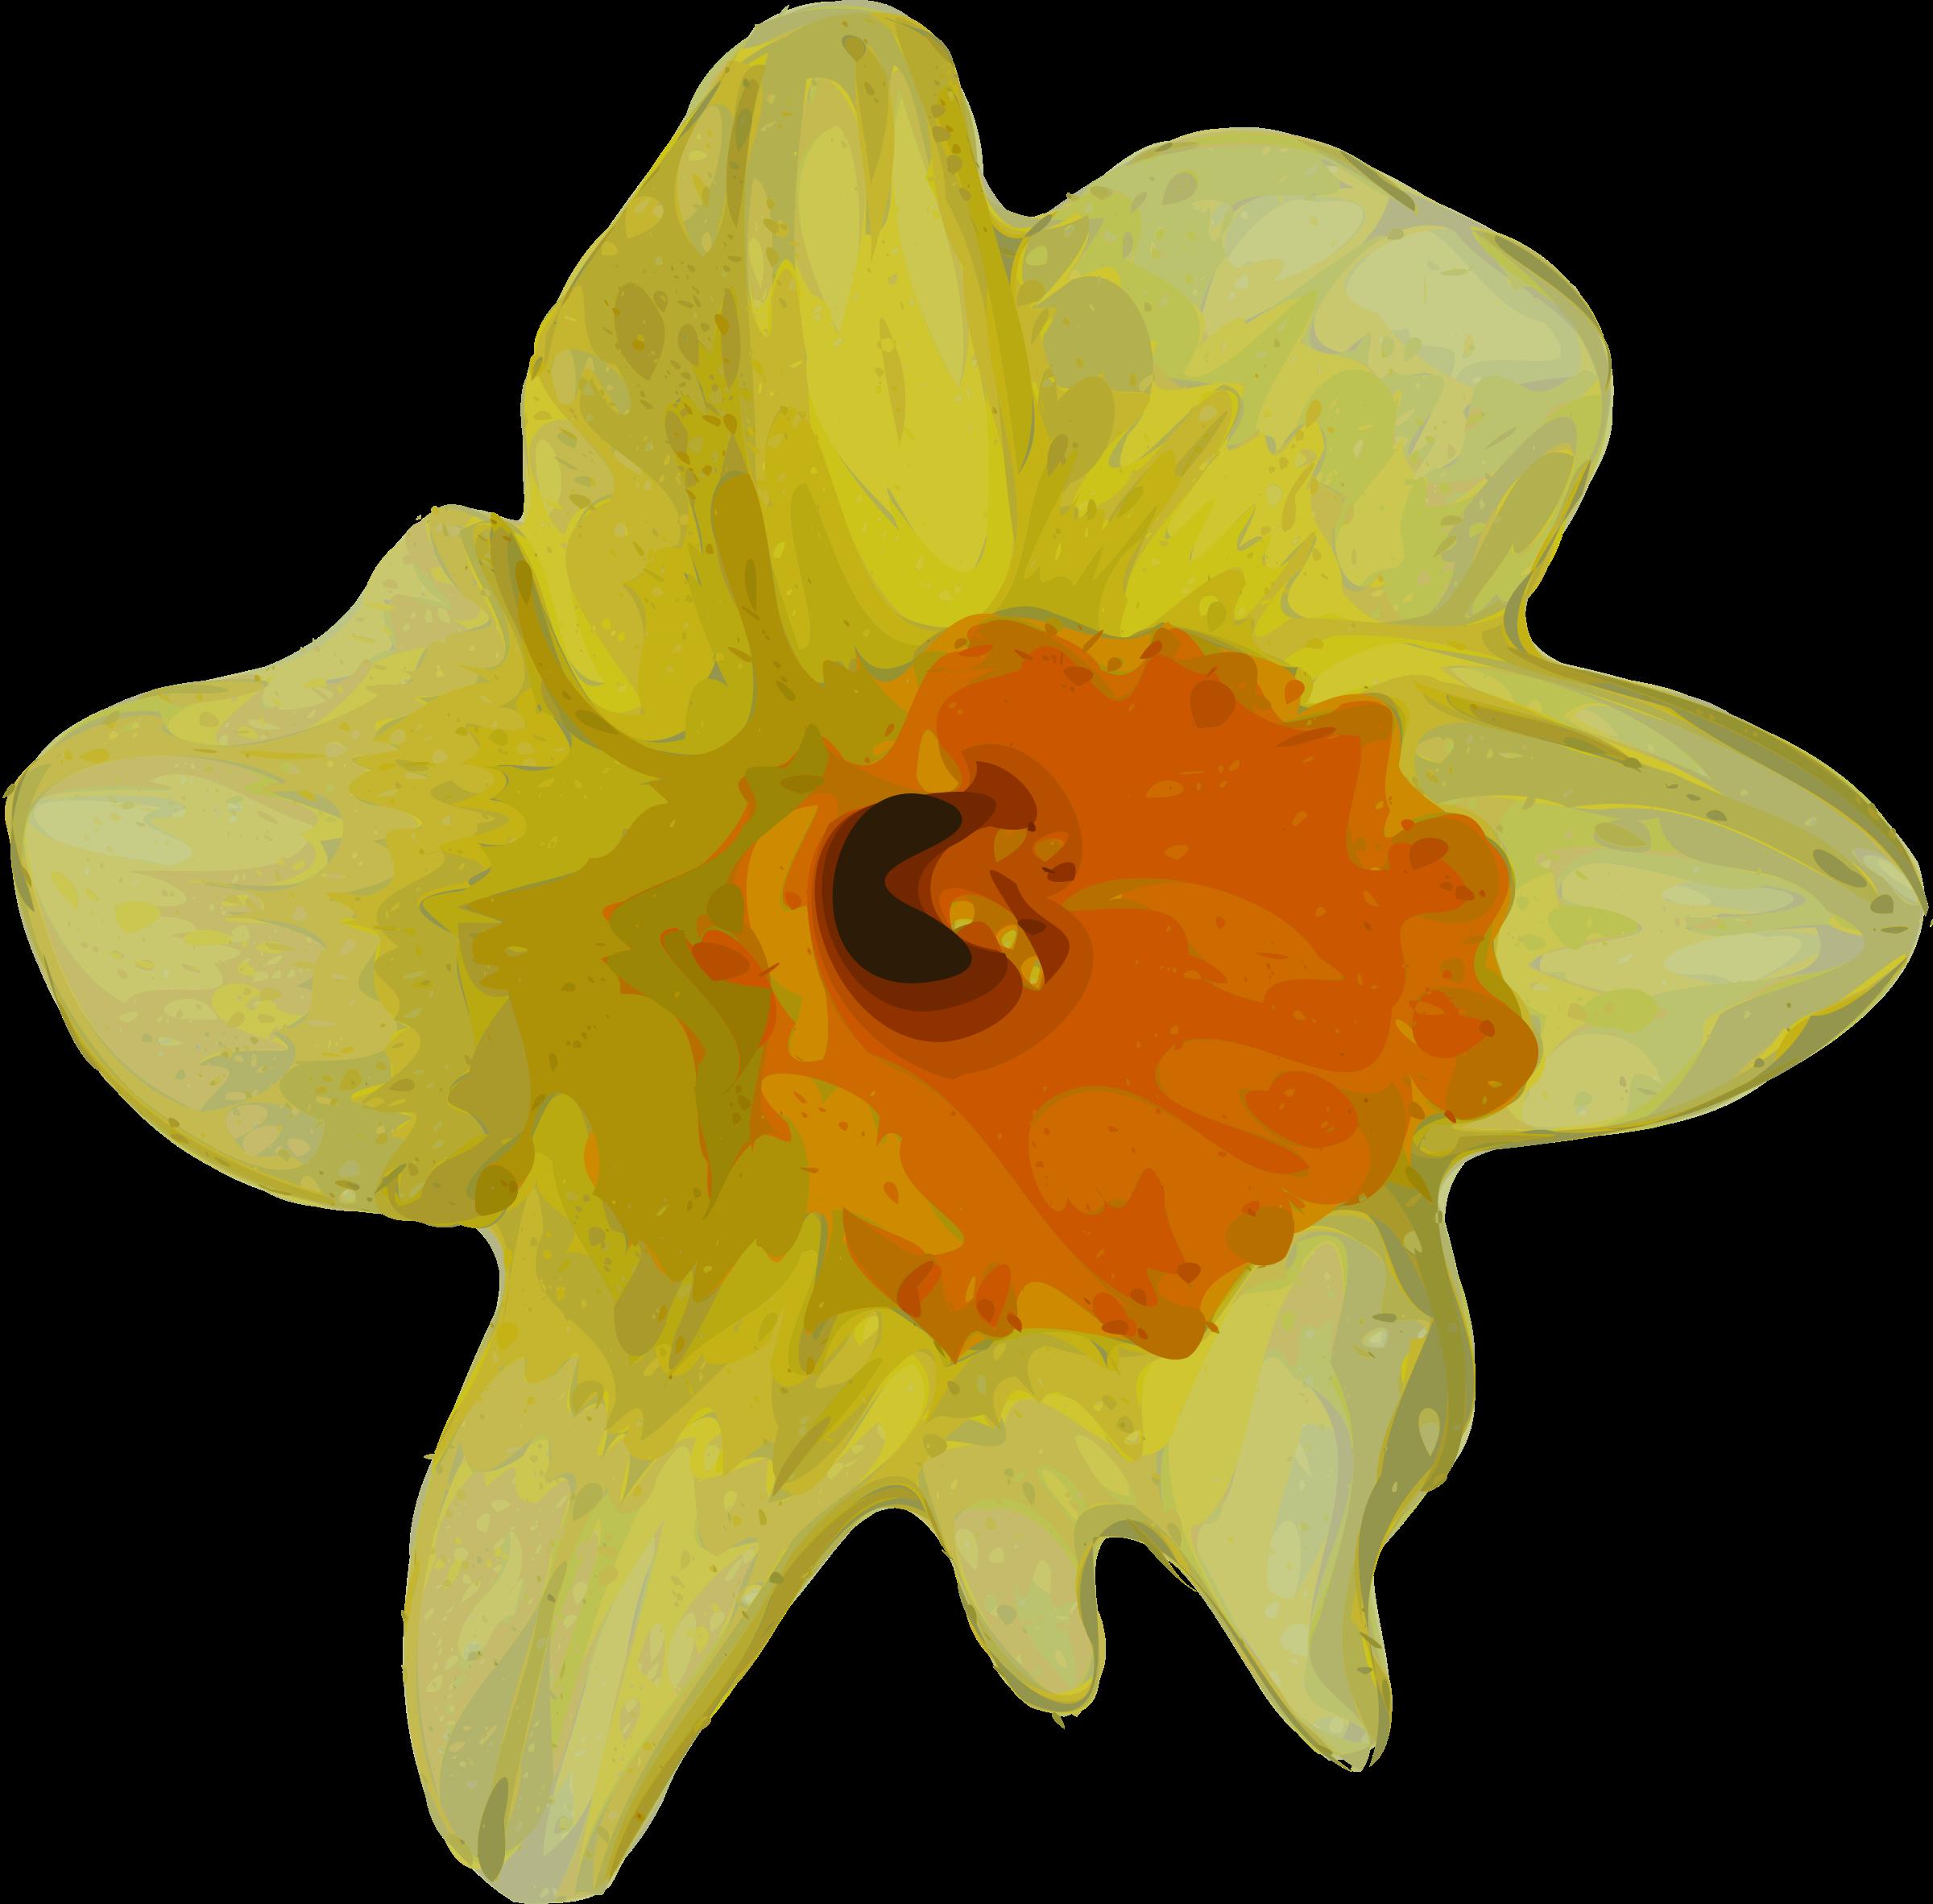 Crocus clipart spring flower Crocus IMAGE (PNG) BIG Clipart